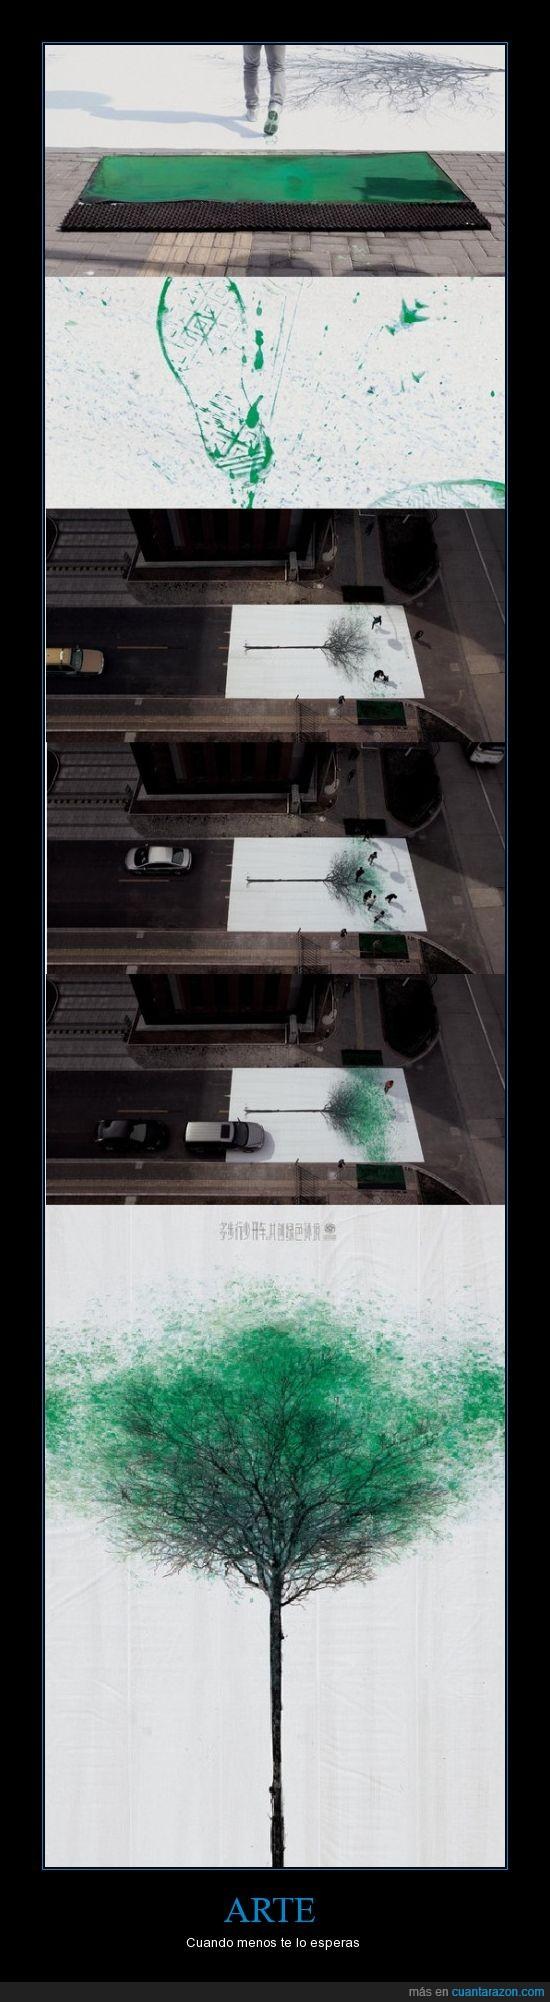 arbol,arte,calle,carretera,china,copa,hojas,pintura,pisada,verde